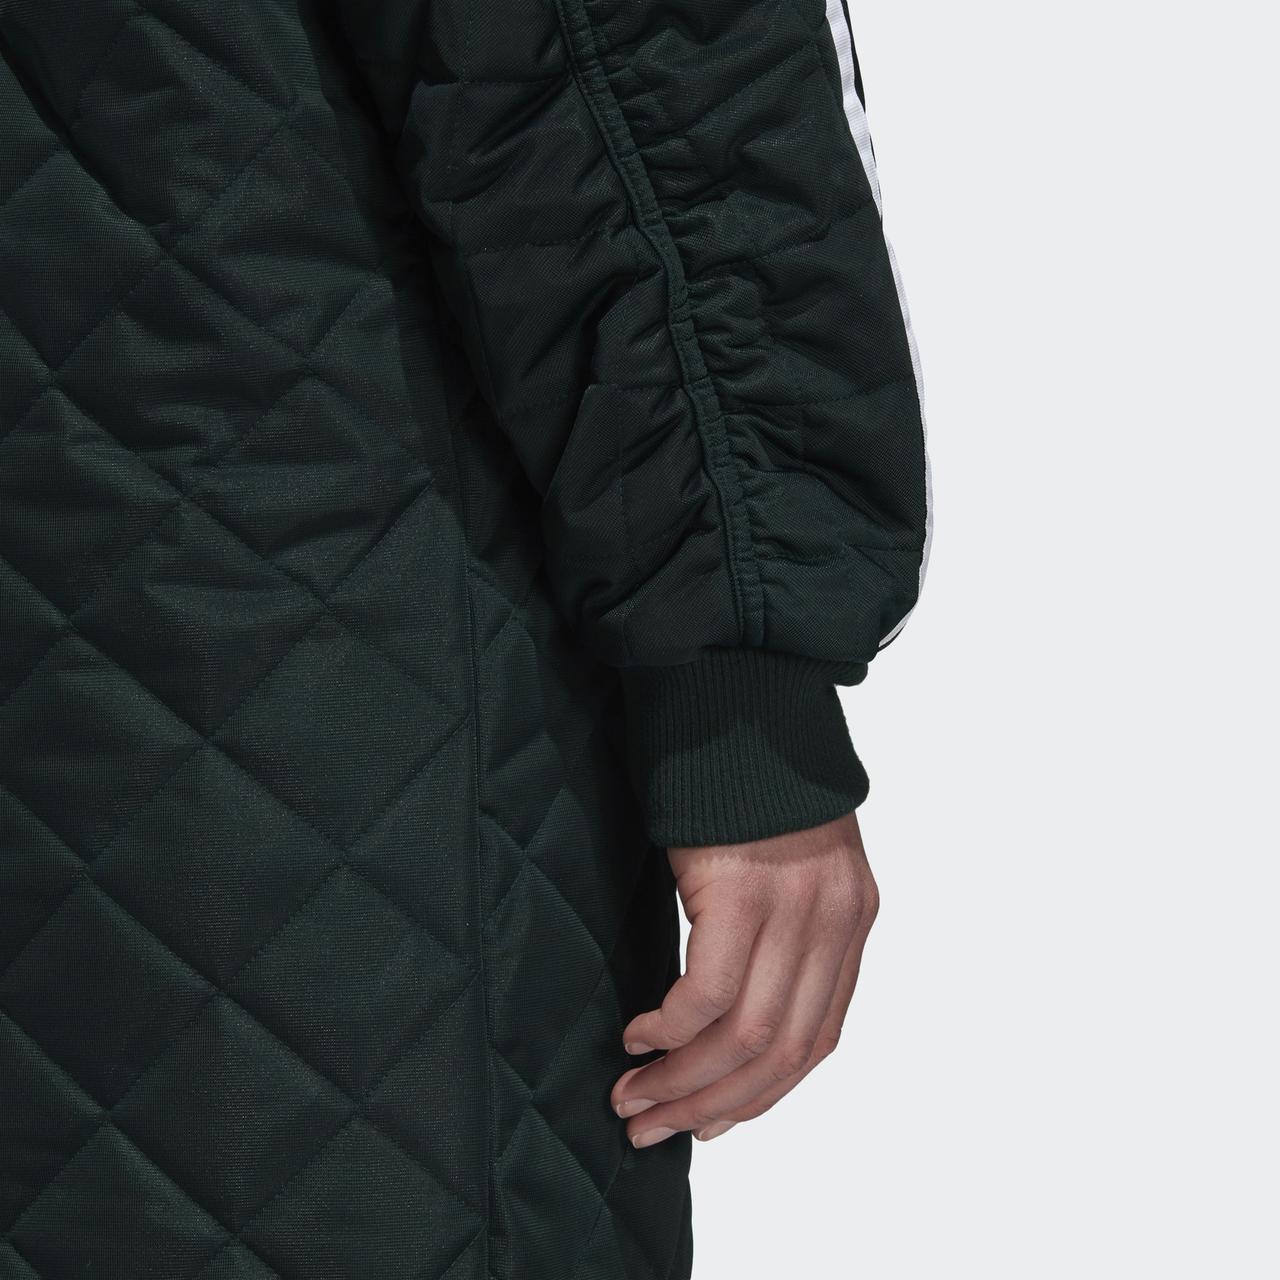 edb330ae4937 ... Женская куртка Adidas Originals Long Bomber (Артикул  DH4592), фото 9